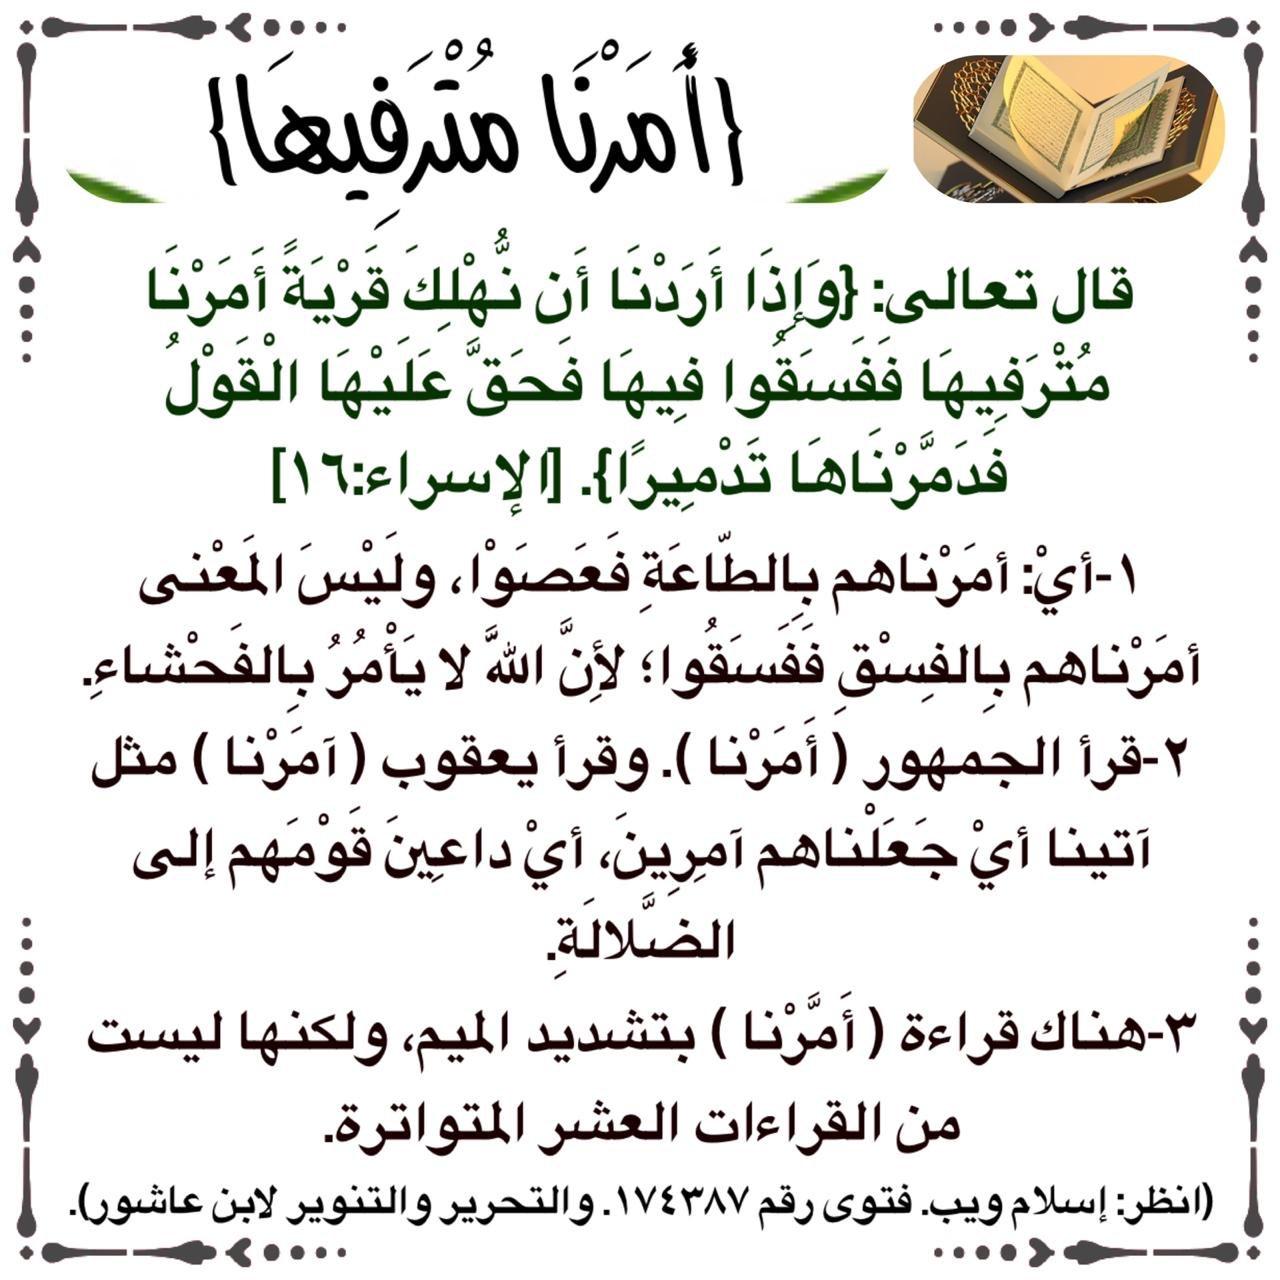 امرنا مترفيها ففسقوا فيها اسلام ويب